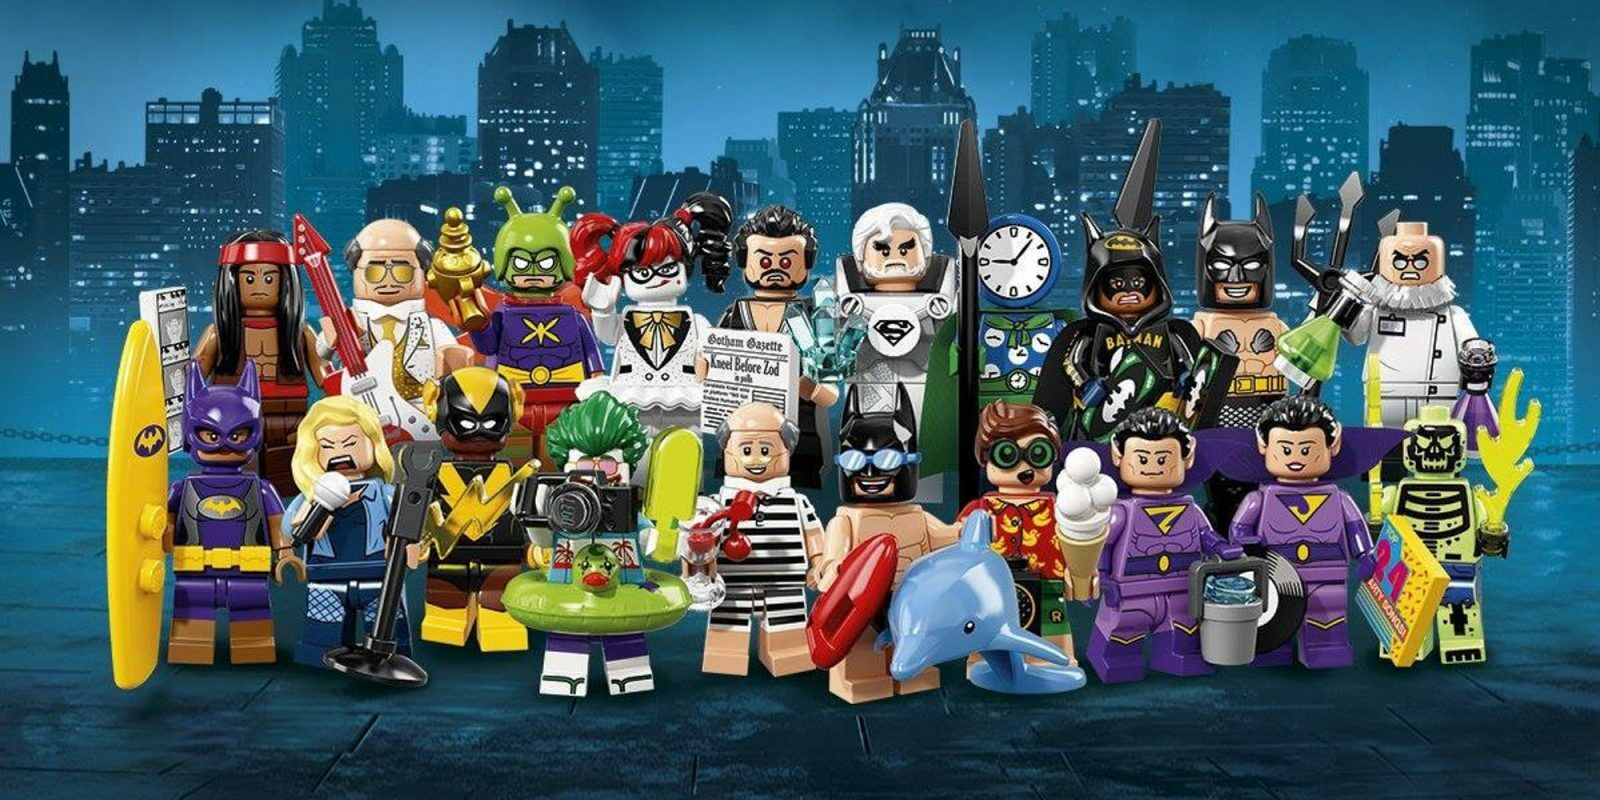 LEGO 71020 - Batman Movie Series 2 - Collectible Mini Figure Set - 20 Minifigs